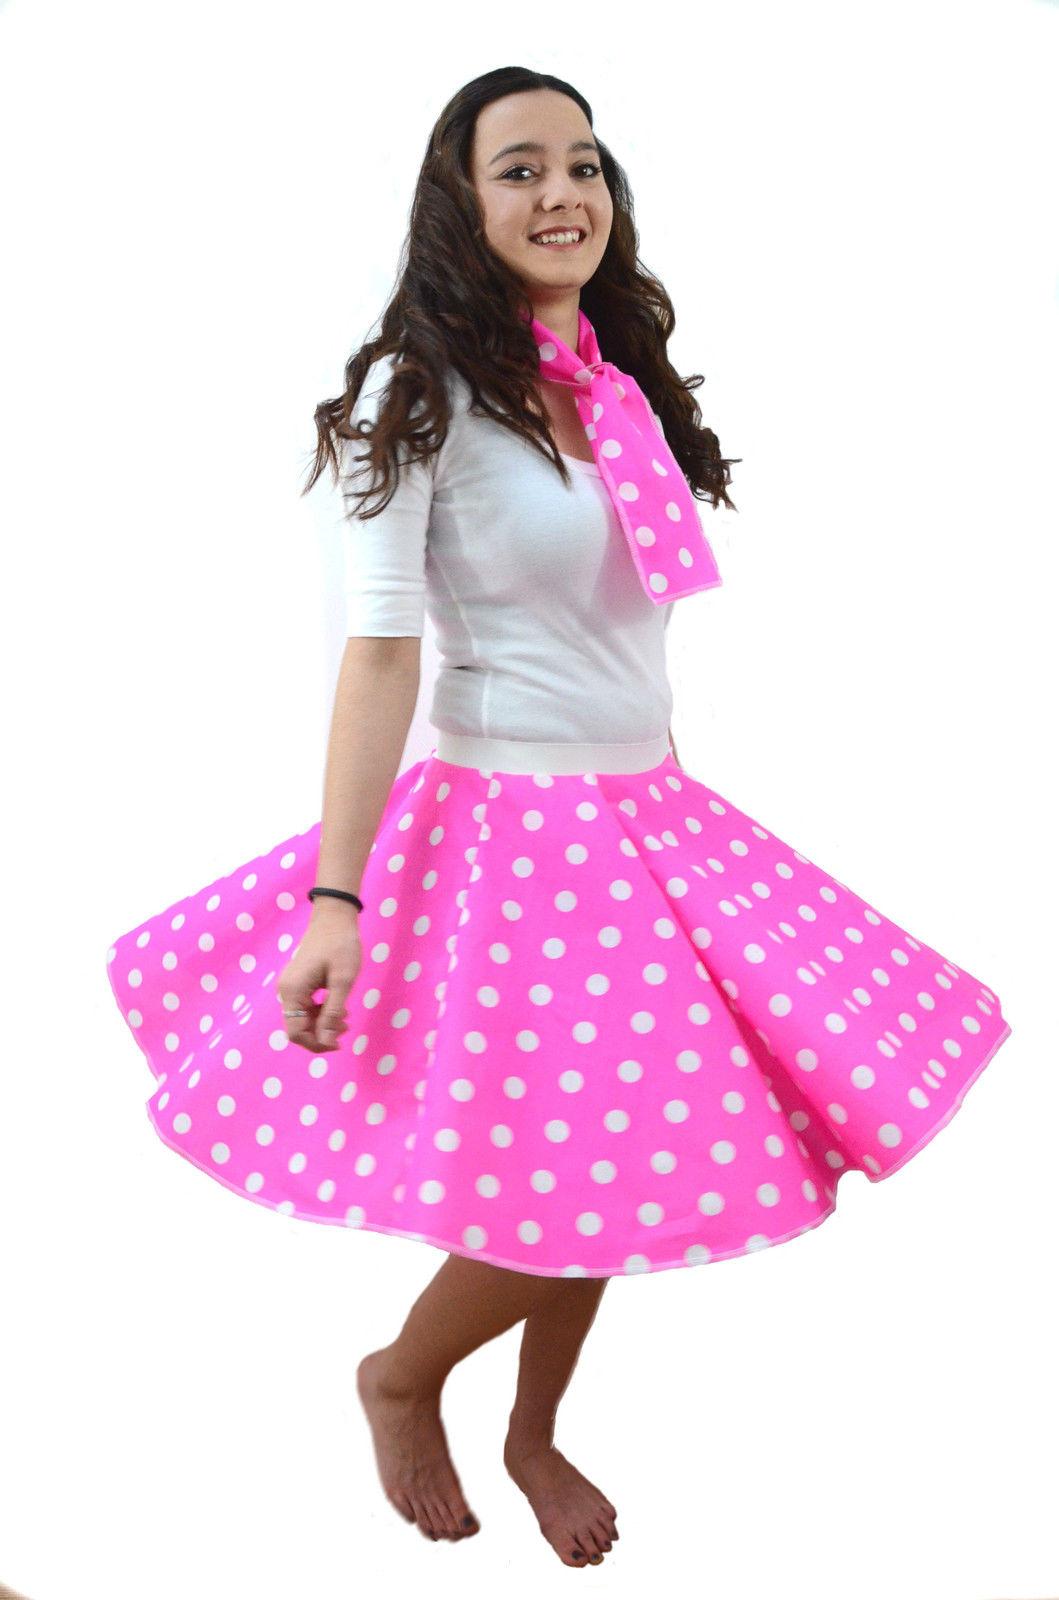 83d1fe94640e Plus Size Circle Polka Dot Rock N Roll Skirt & Scarf Set 1950S 60S Pink  Ladies